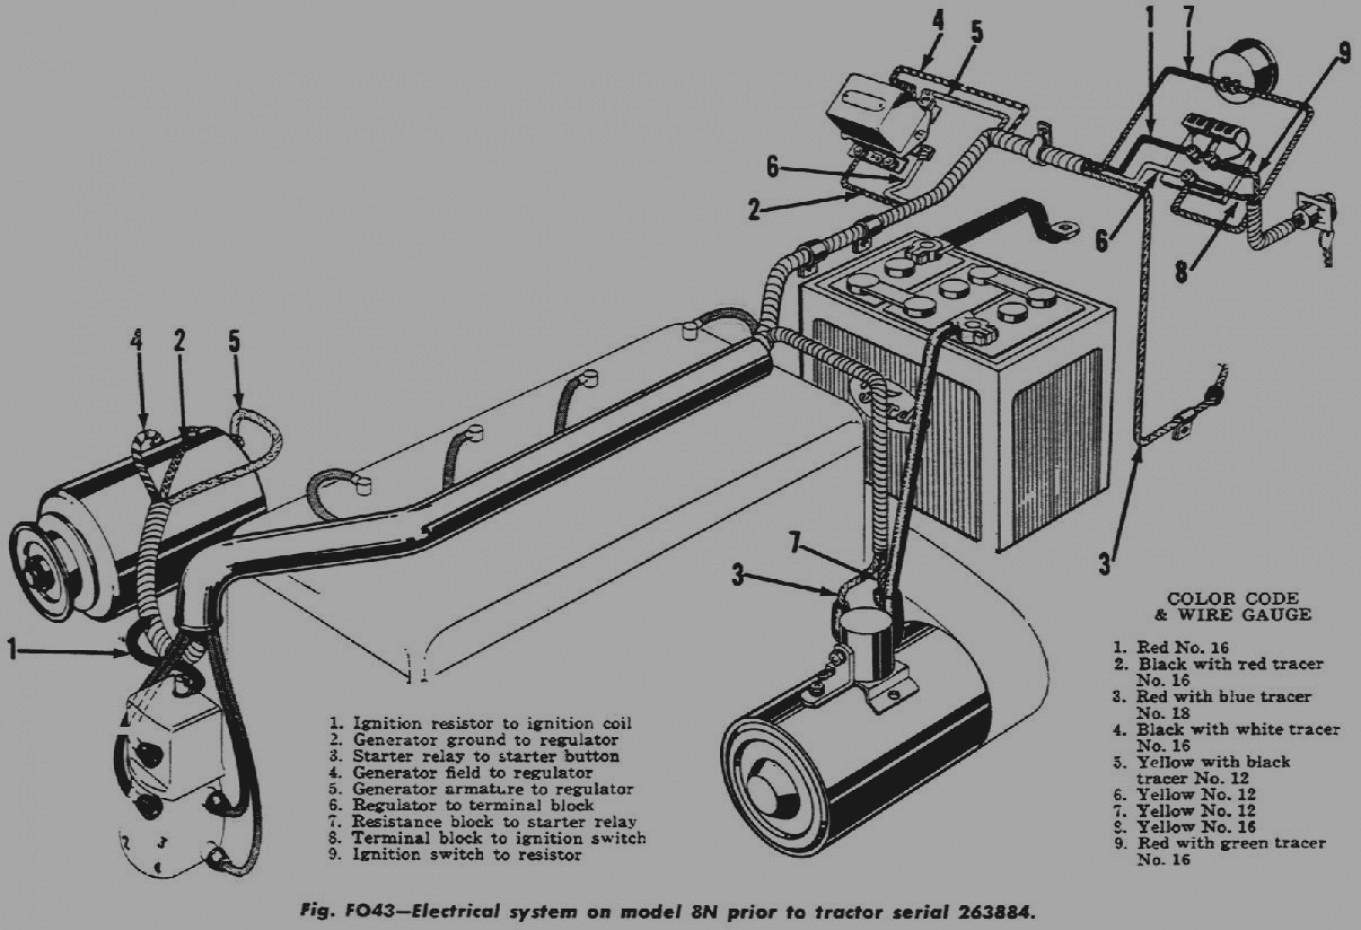 8n ford tractor starter wiring diagram online wiring diagram8n ford tractor starter solenoid wiring diagram wiring diagram1953 ford tractor wiring diagram 6 volt 8n